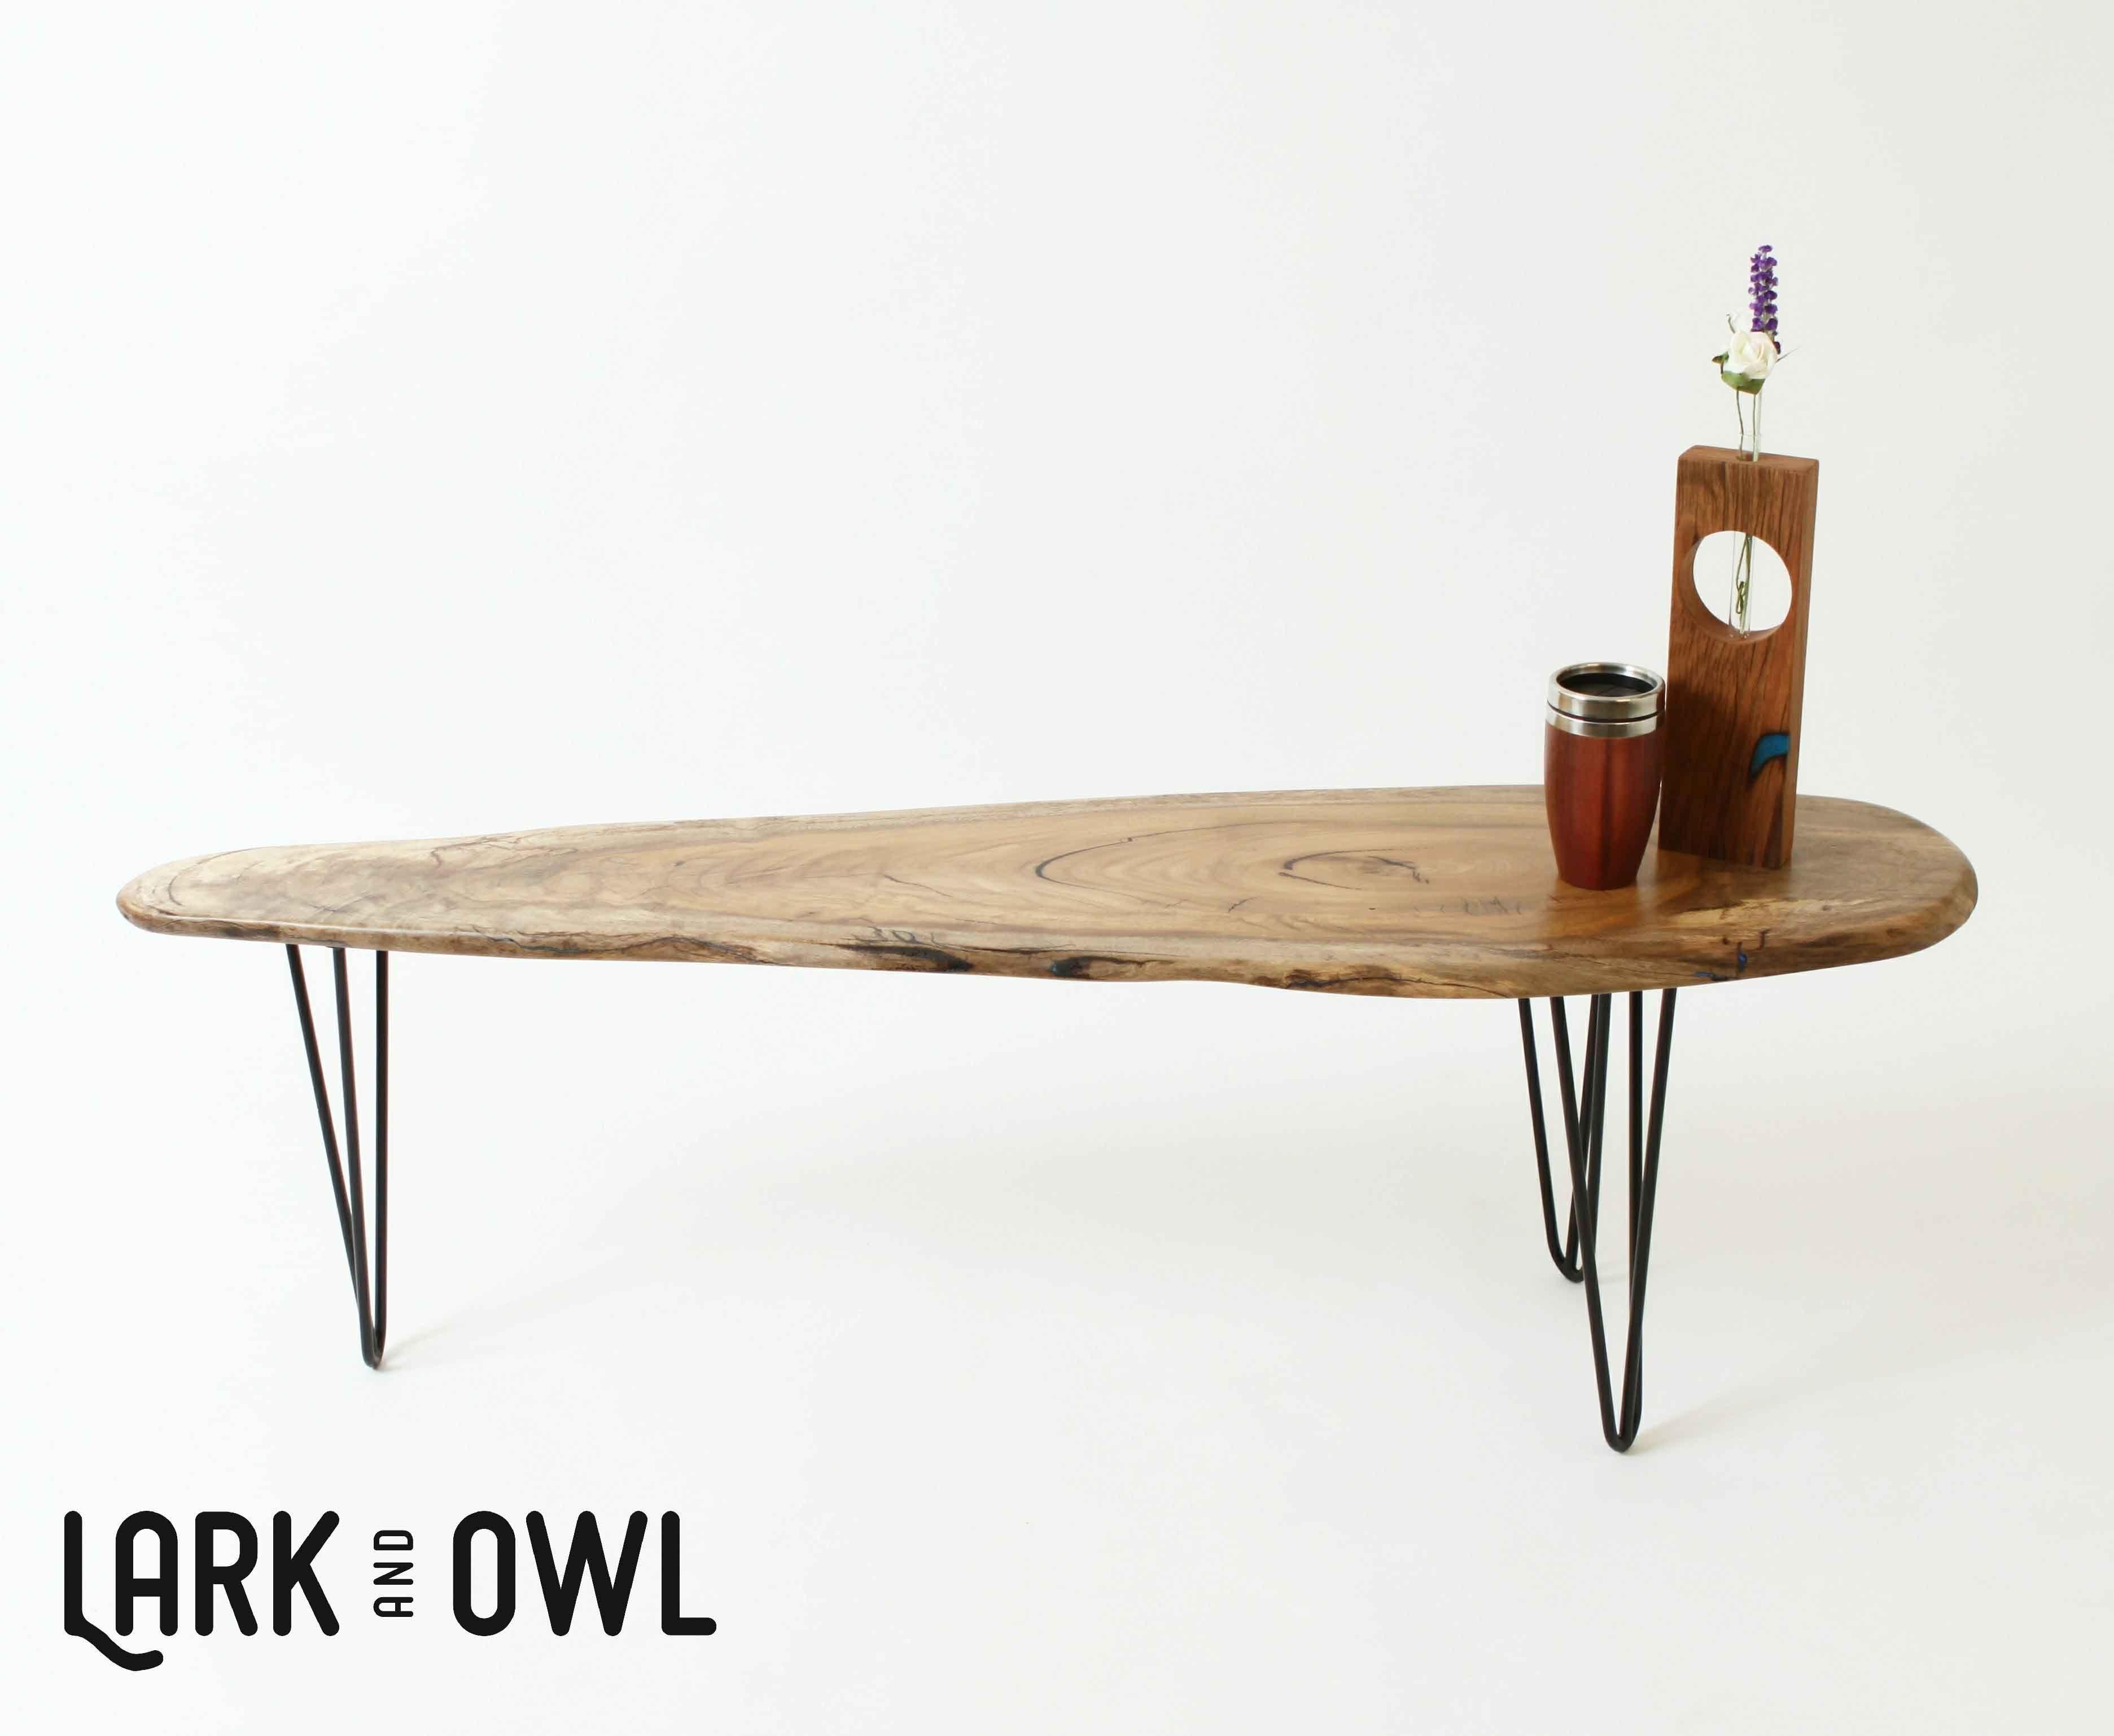 Lark Owl Coffee Table With Vase 1 3m X 46 Cm H Shoplocal Camphor Servingboard Cheeseboard Board Timber W Coffee Table Owl Coffee Furniture Making [ 3076 x 3745 Pixel ]